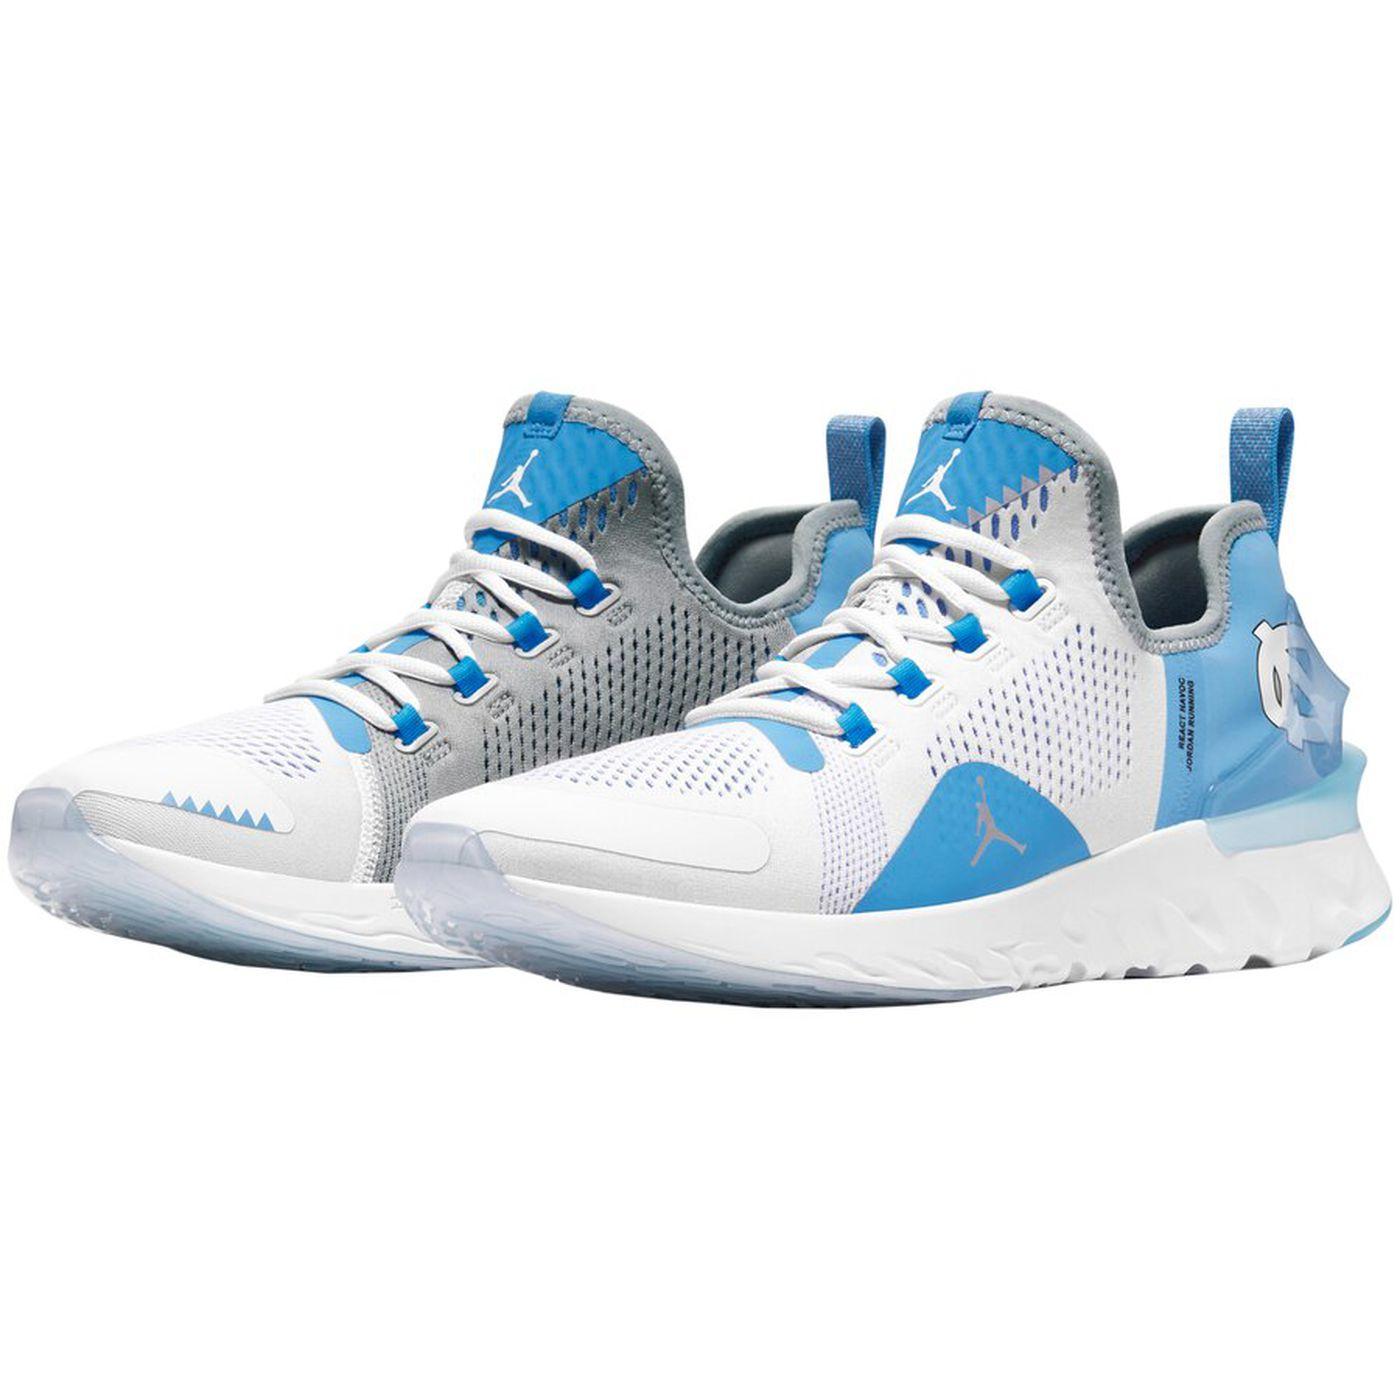 Check out the new Jordan Brand UNC Tar Heels shoe! - Tar Heel Blog